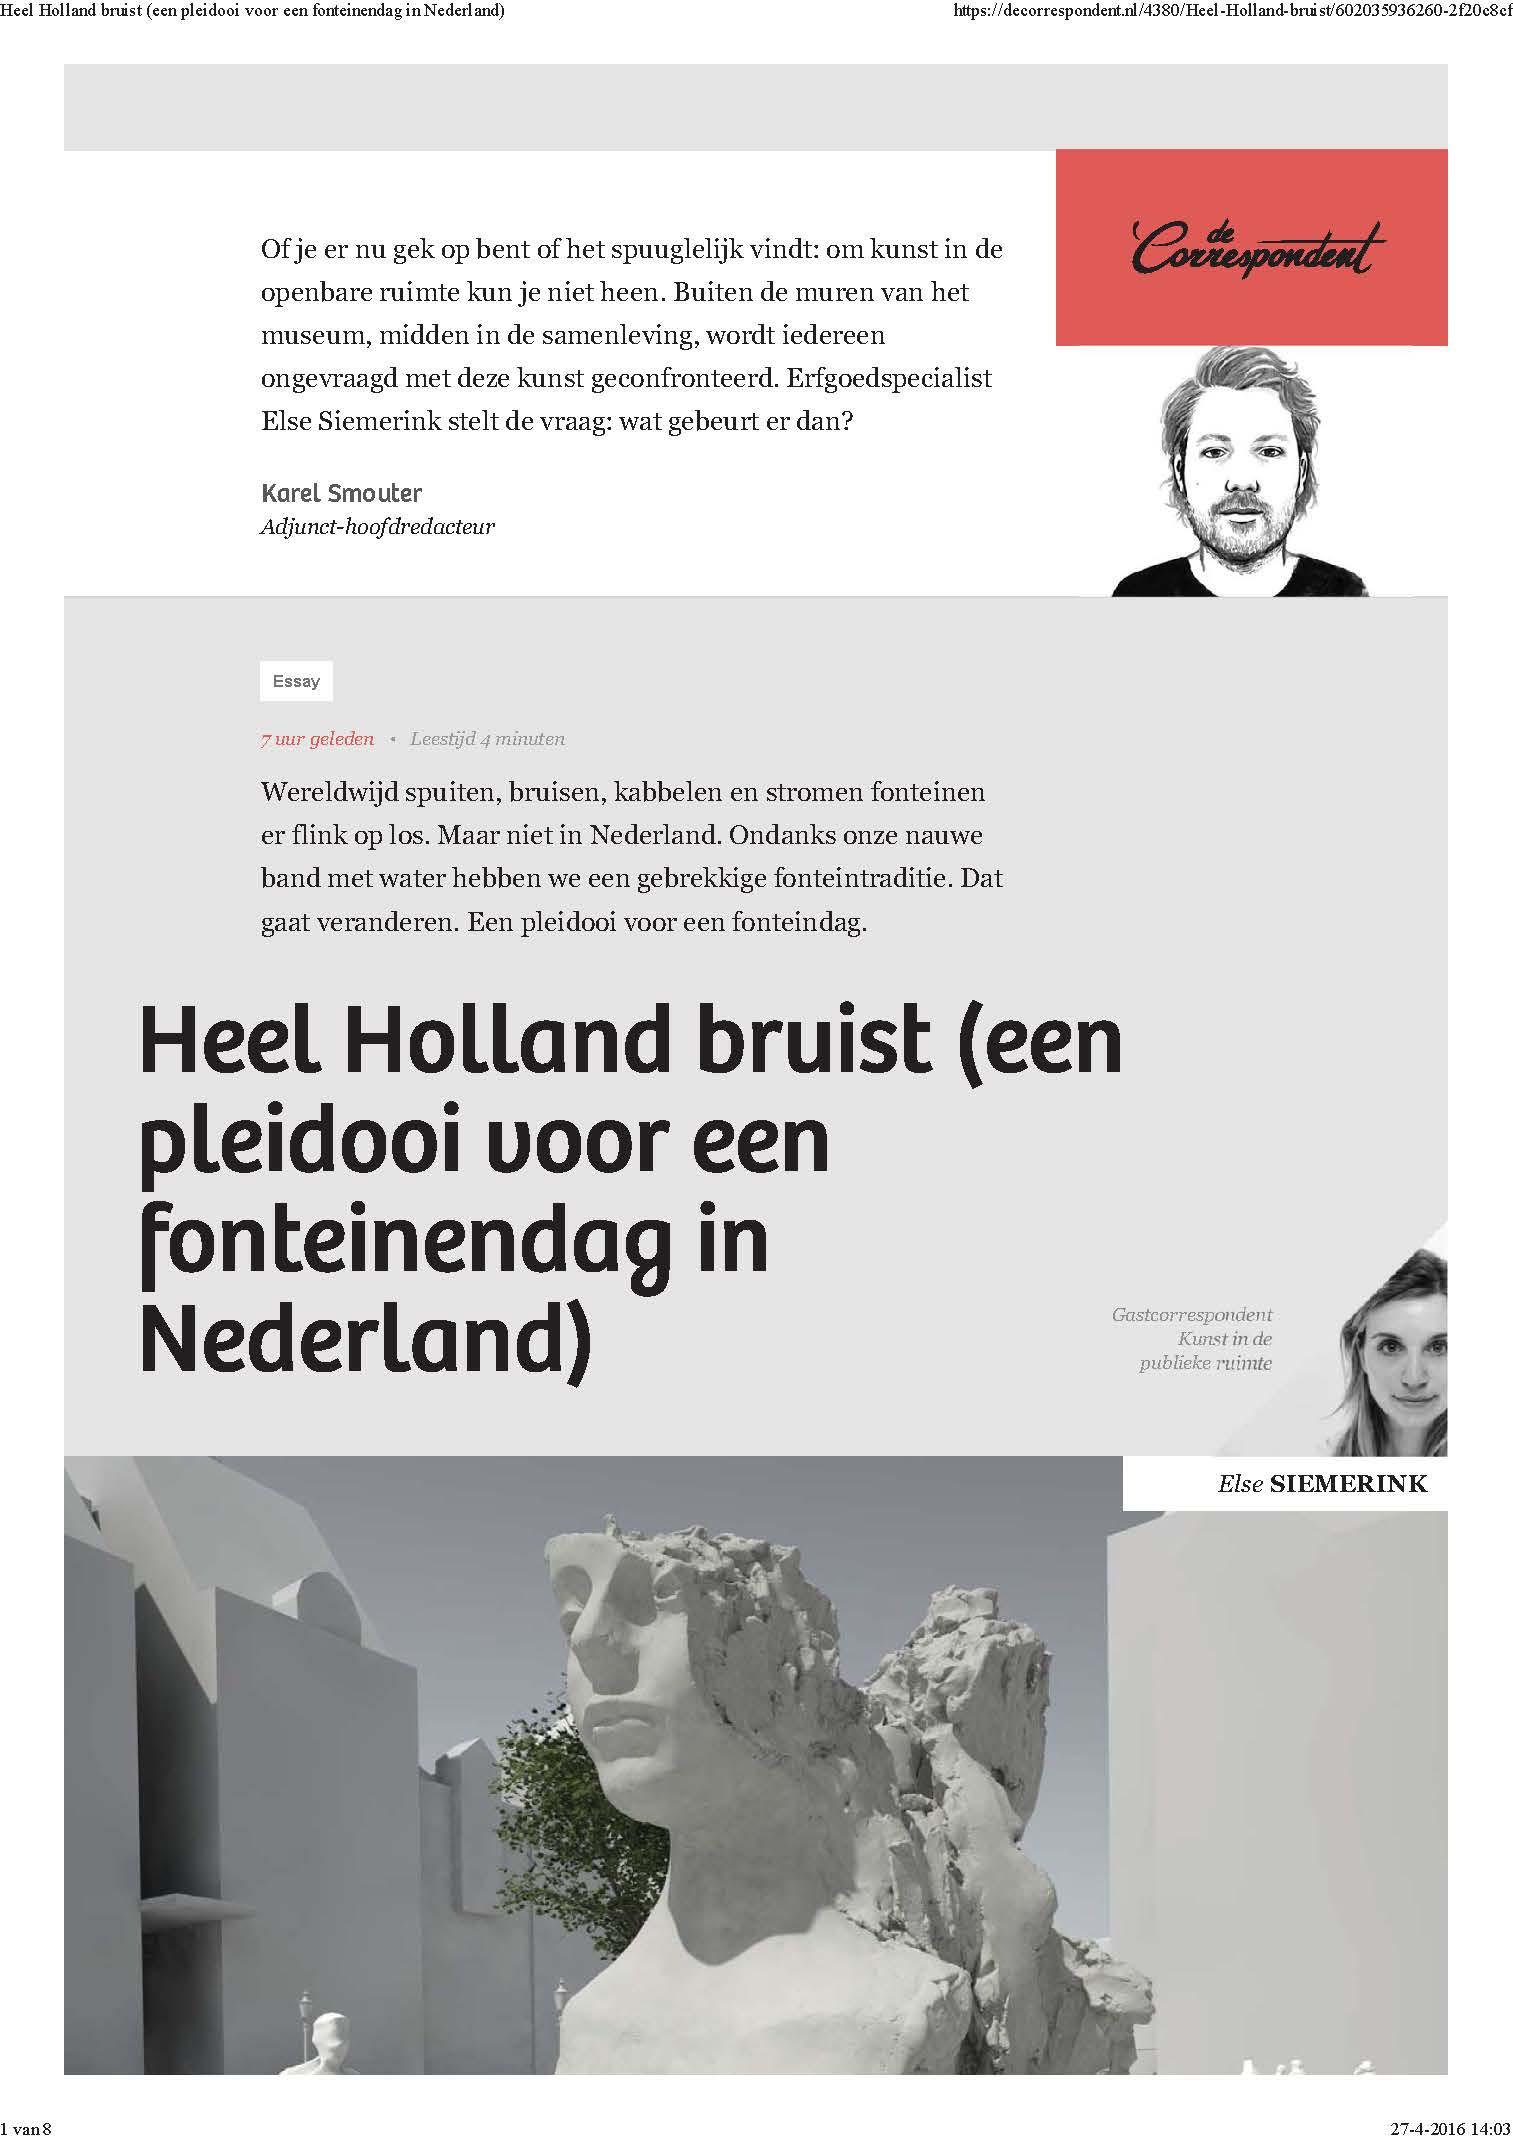 2016 04 27 Heel Holland bruist_Pagina_1